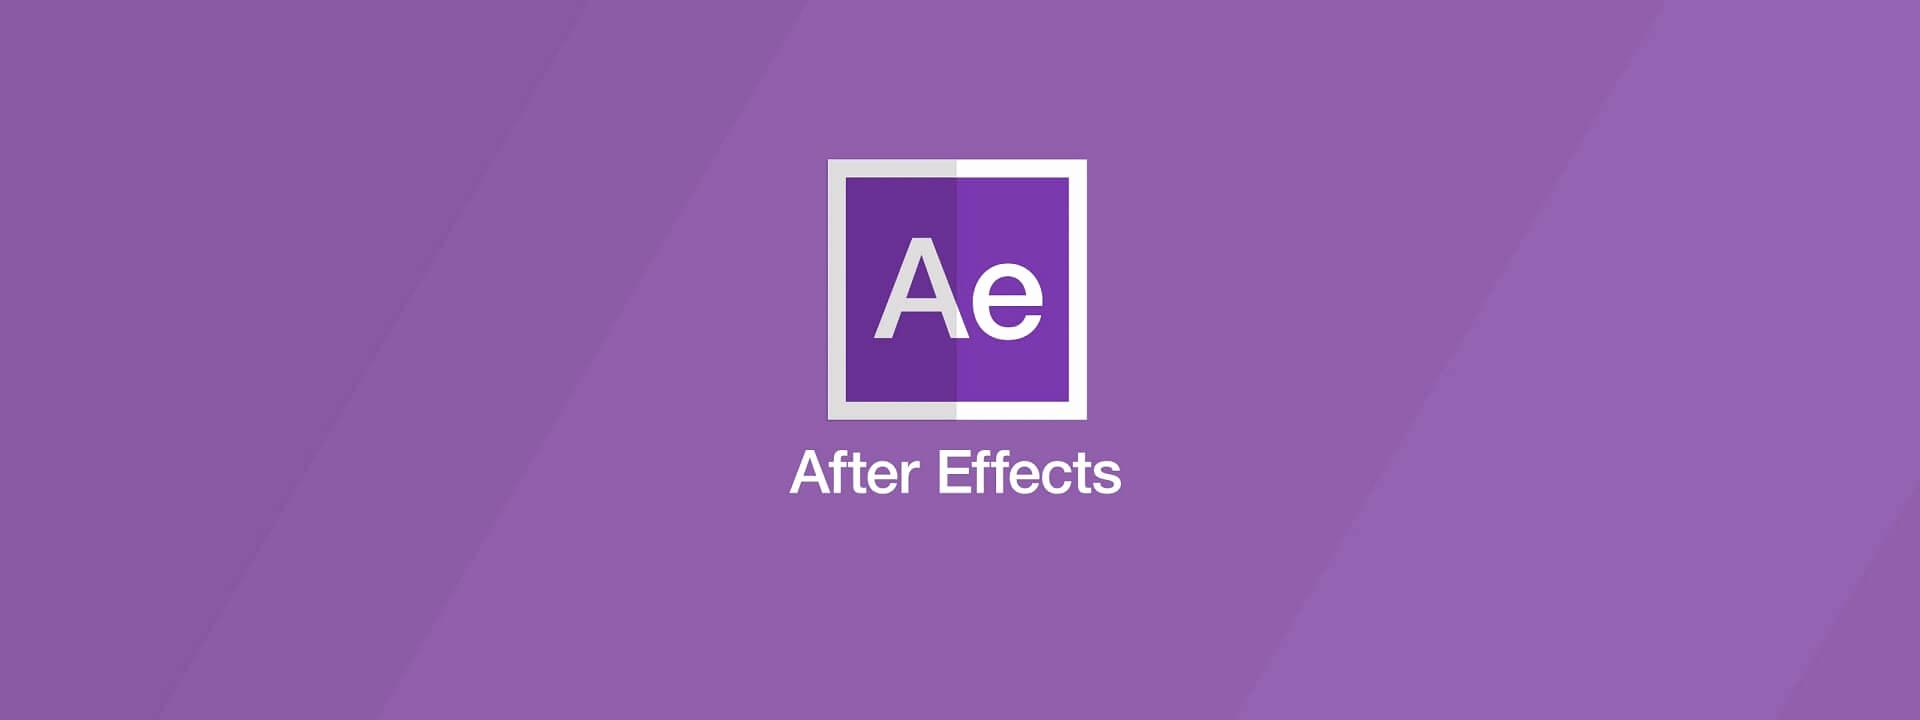 After Effects Free Templates Lovely افتر افکت چیست و چه کاربرد هایی دارد ؟ هاو کن یو